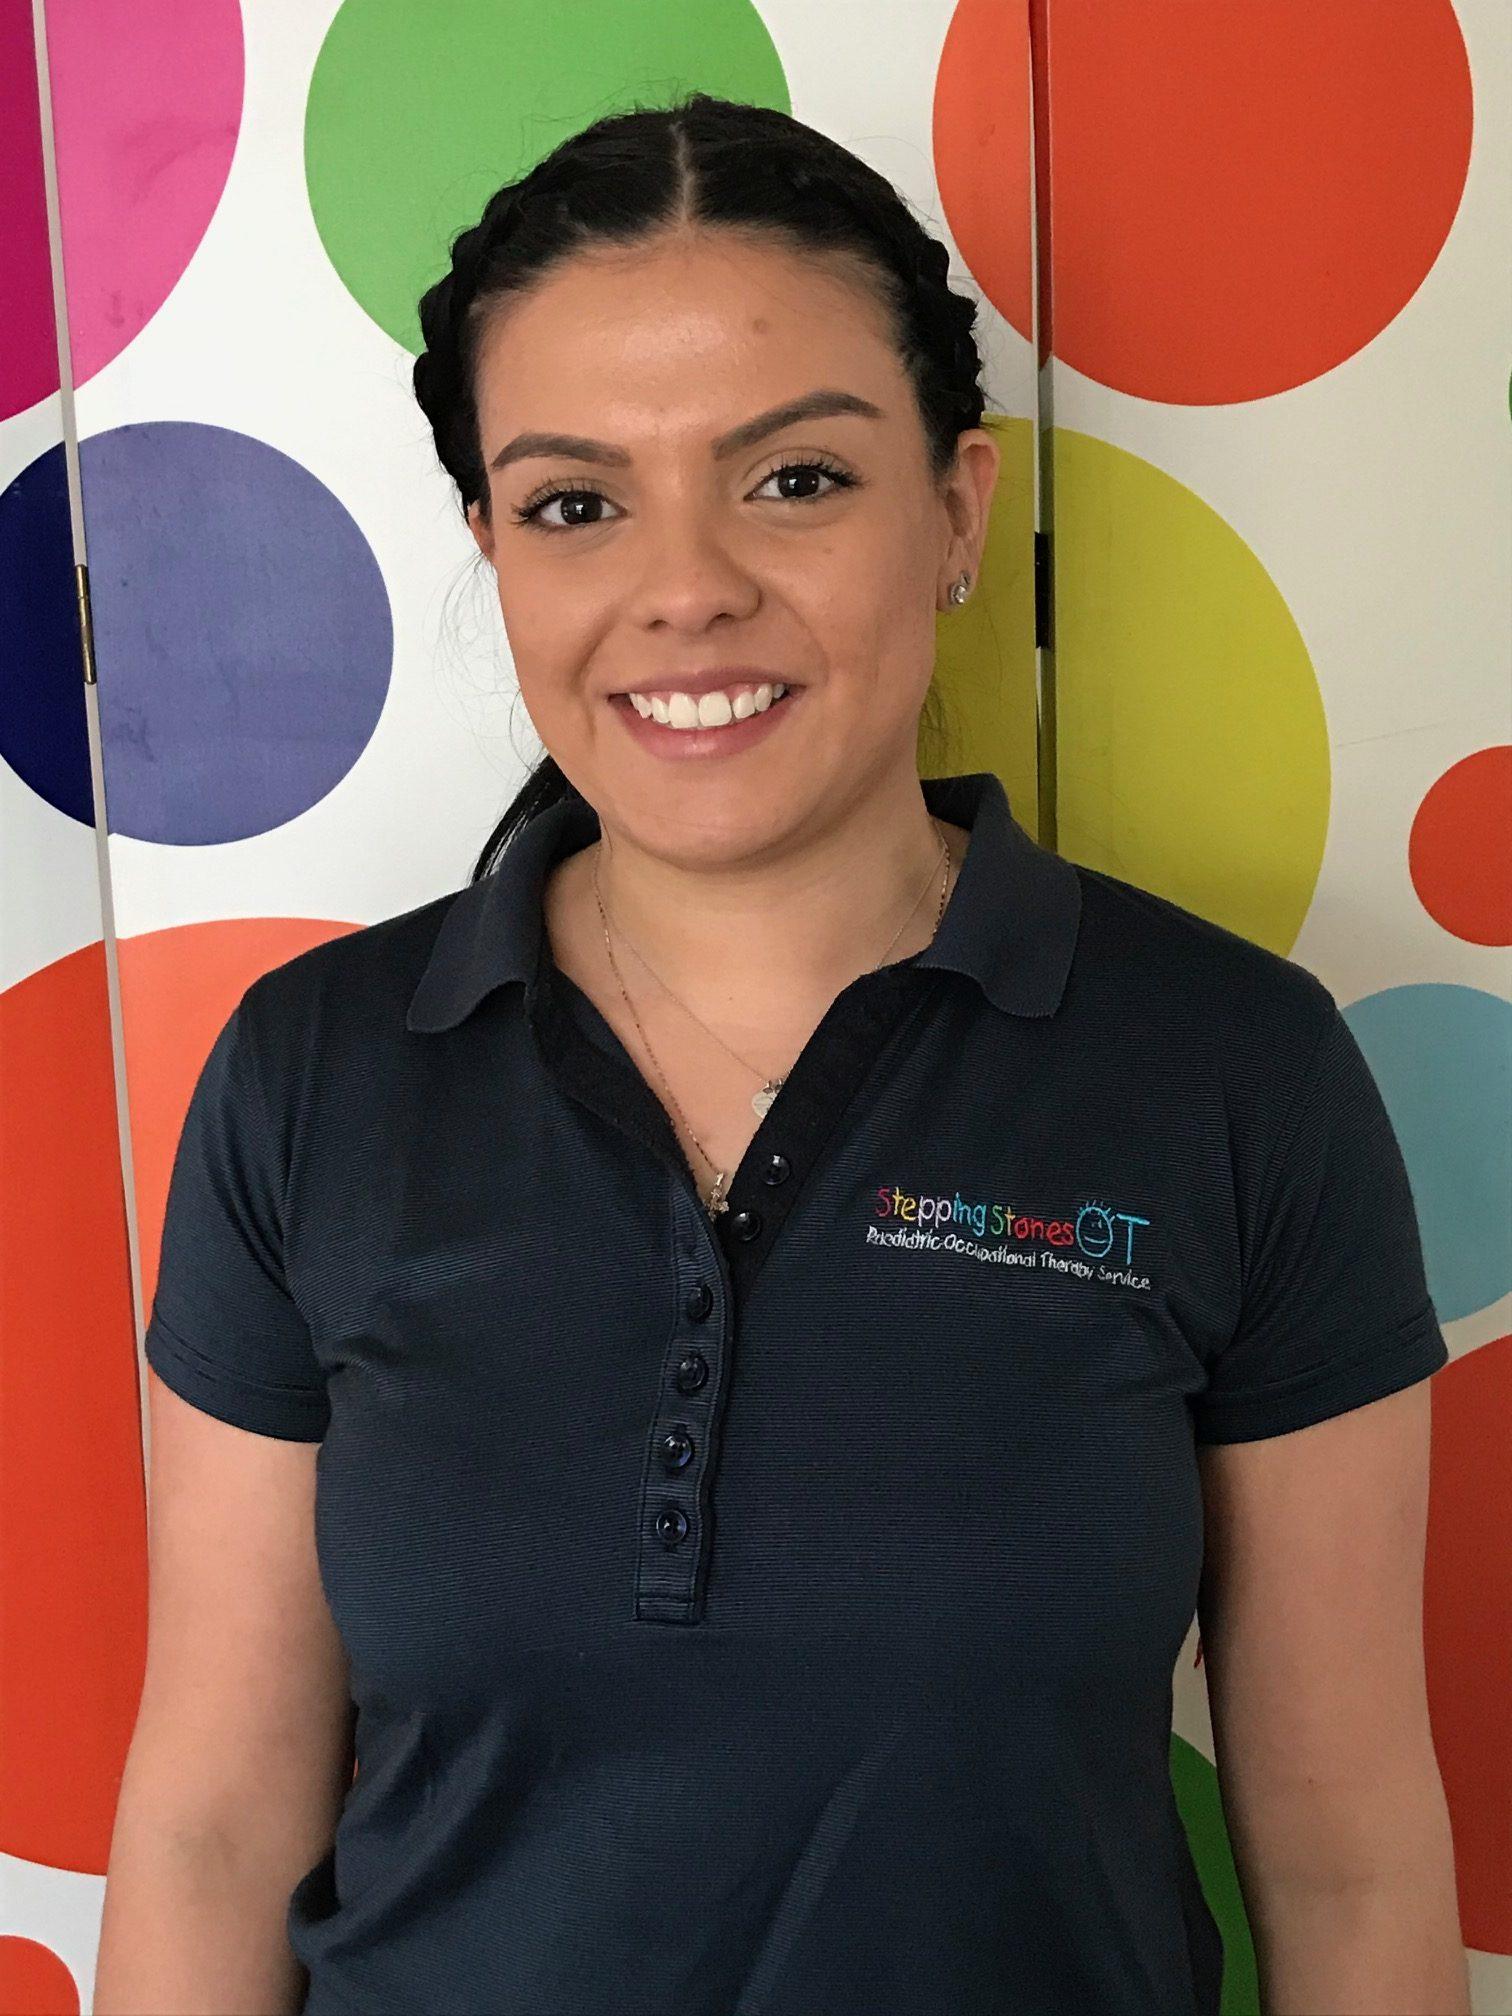 Staff profile photo of Monica Lai of Stepping Stones OT